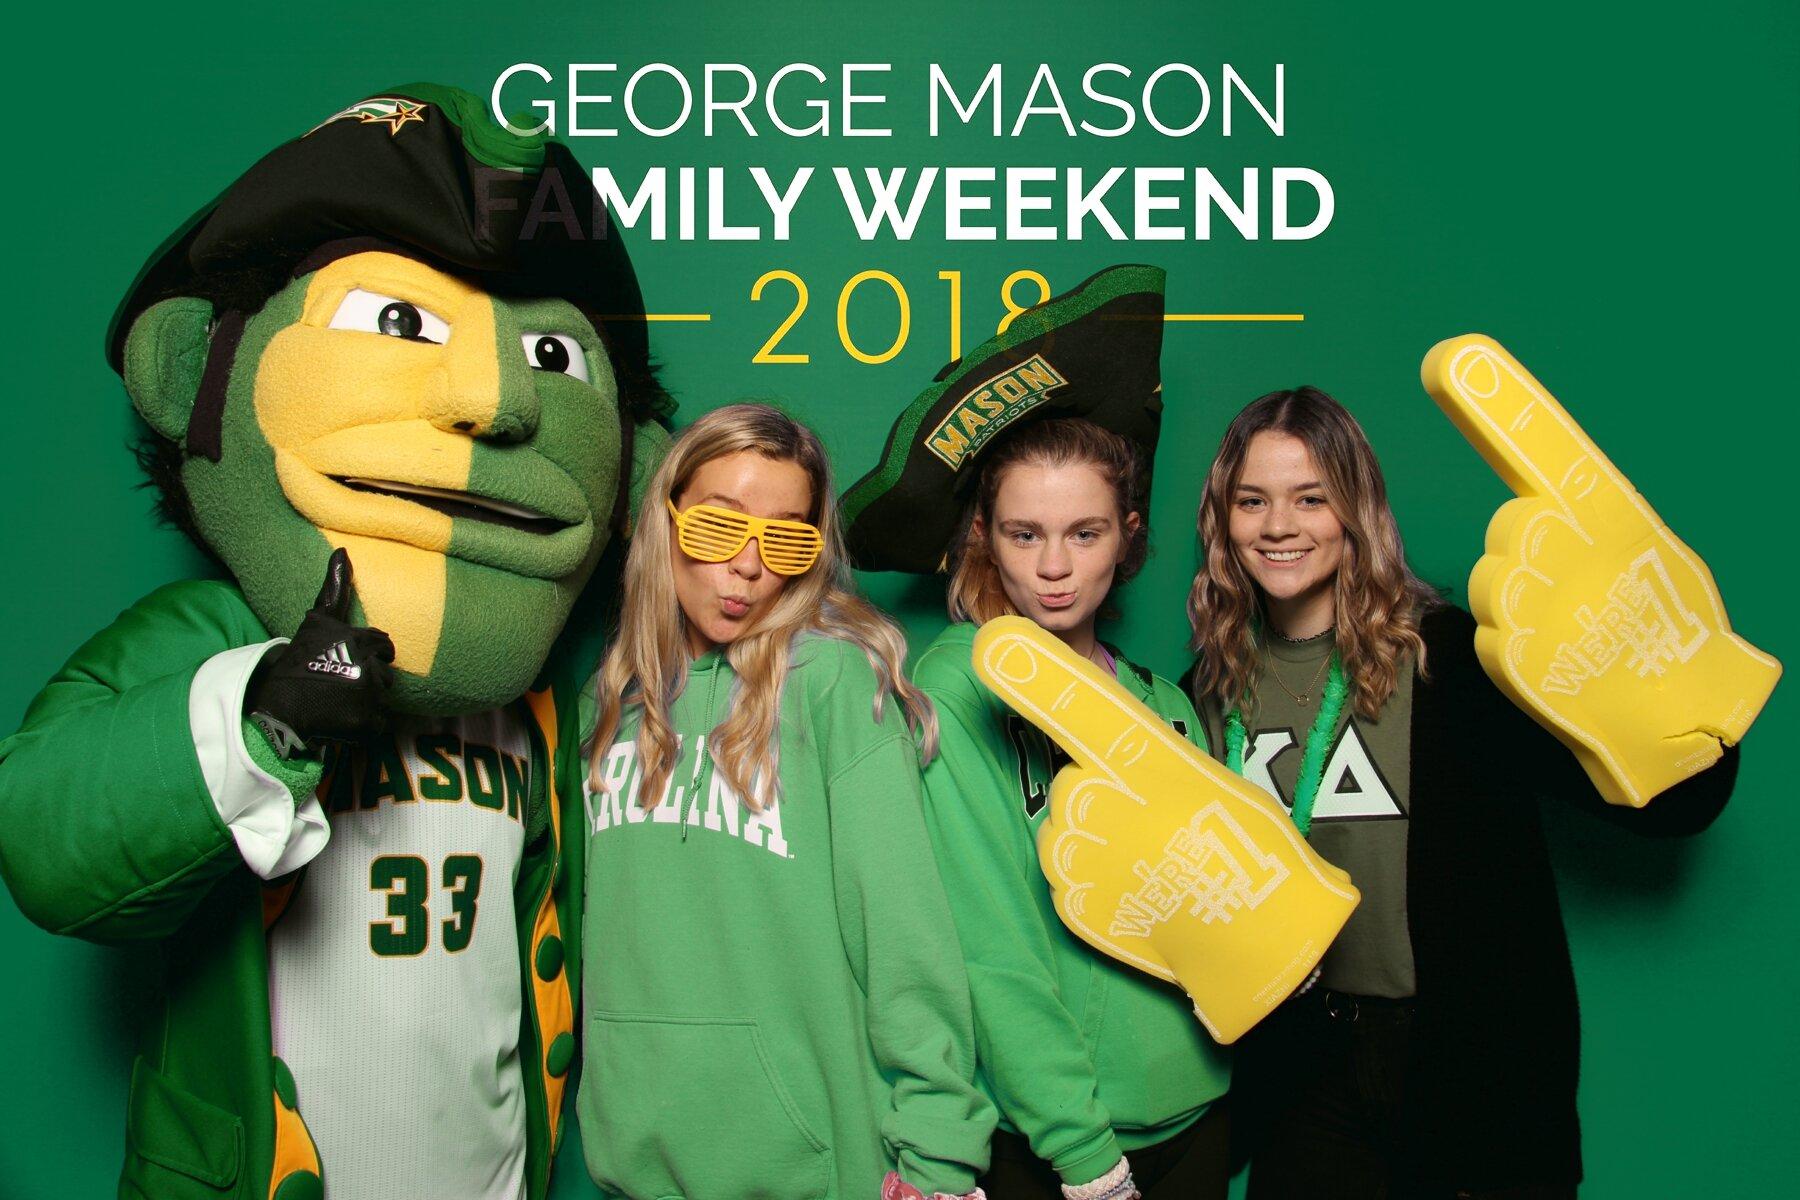 George Mason University Photo Booth